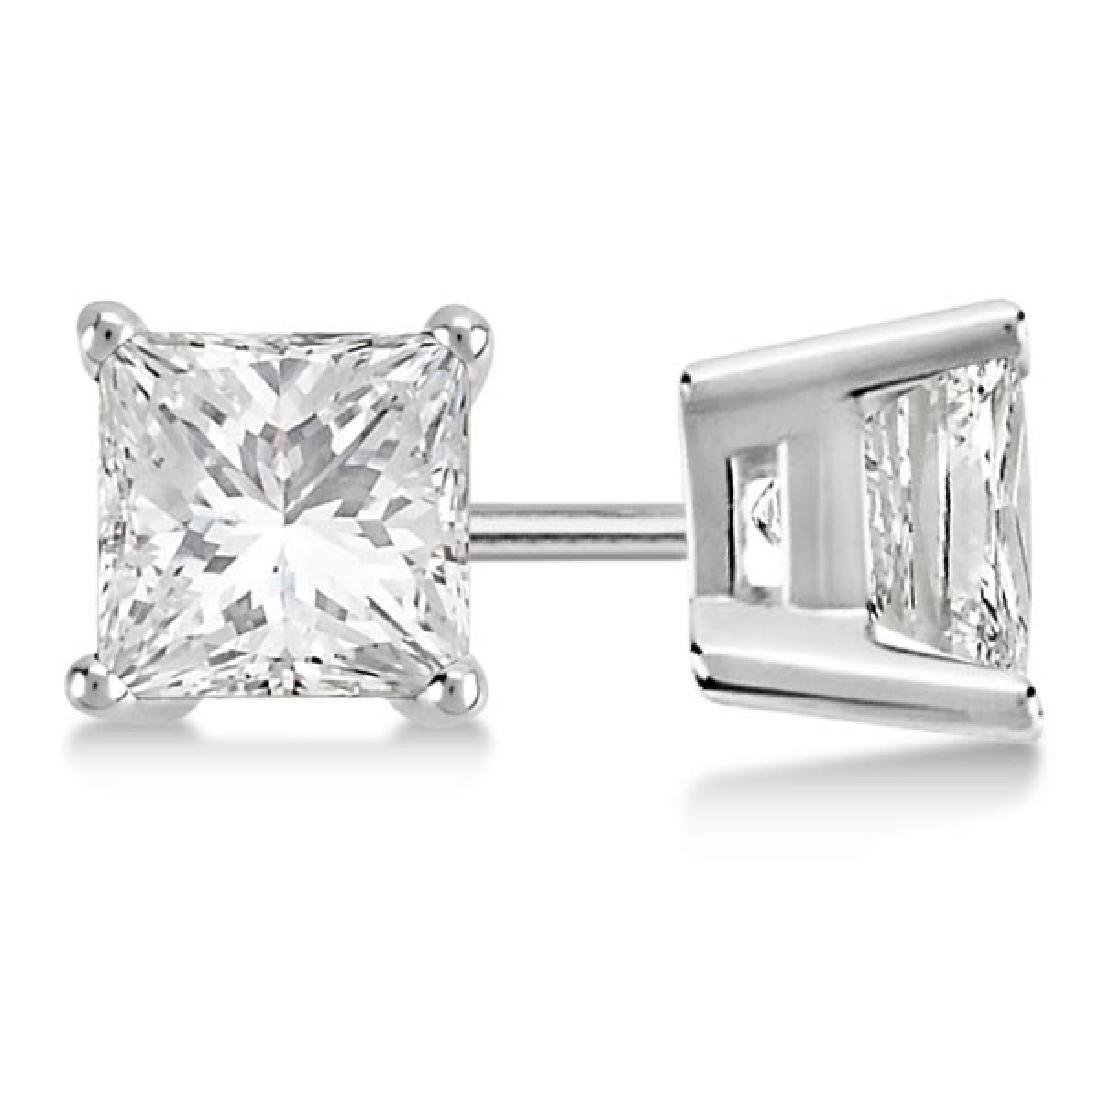 Certified 1 CTW Princess Diamond Stud Earrings E/SI1